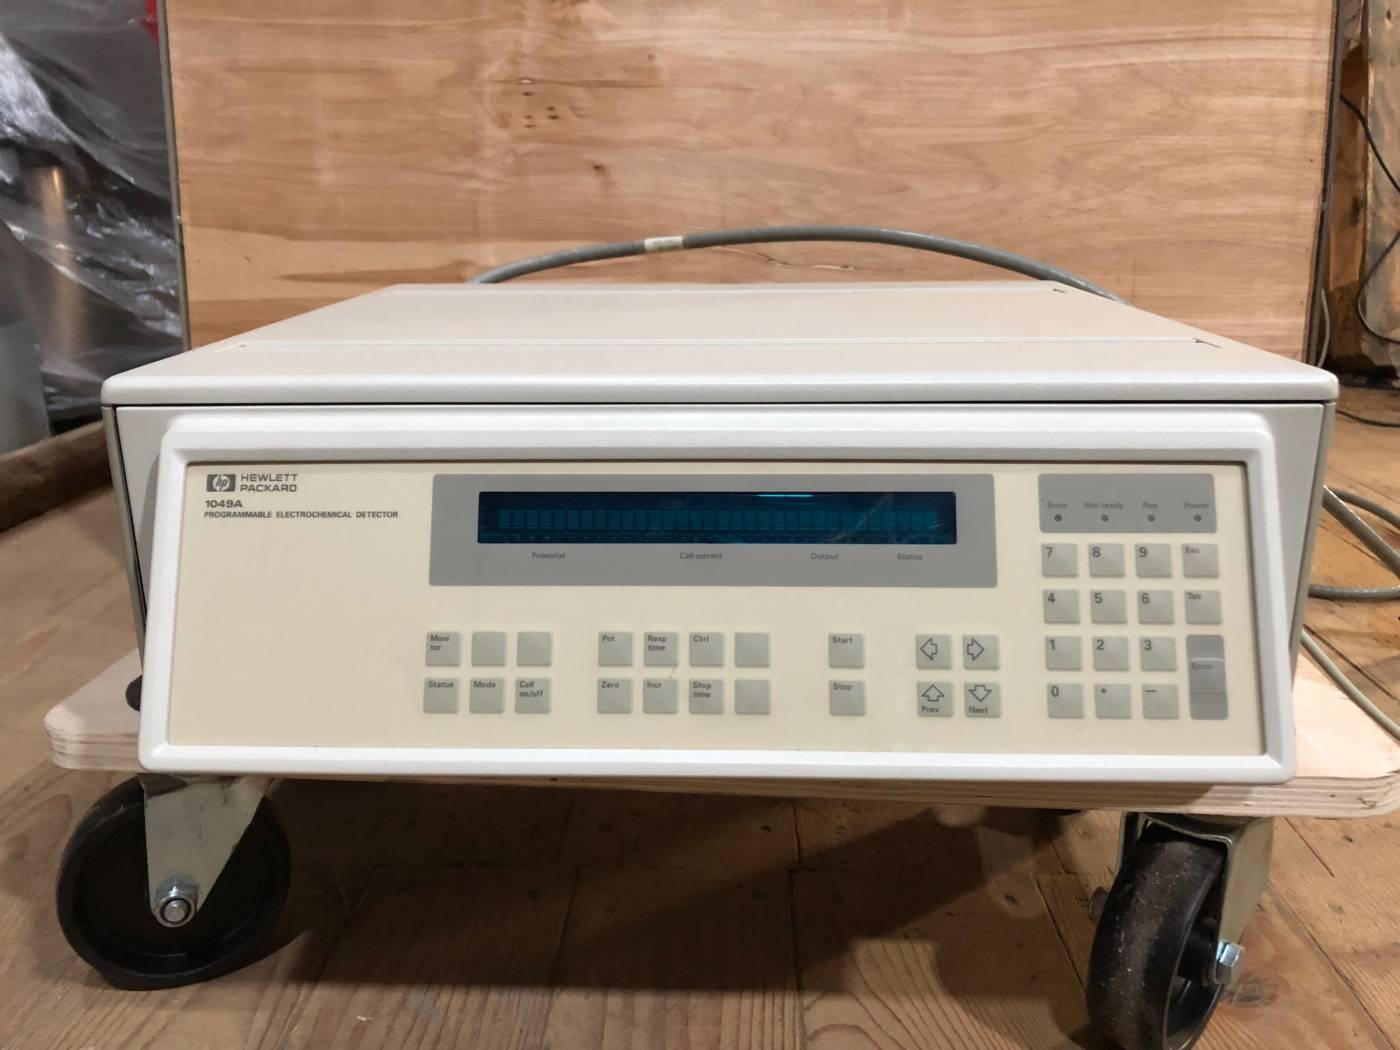 Hewlett Packard / Programmable Electrochemical Detector 1049A